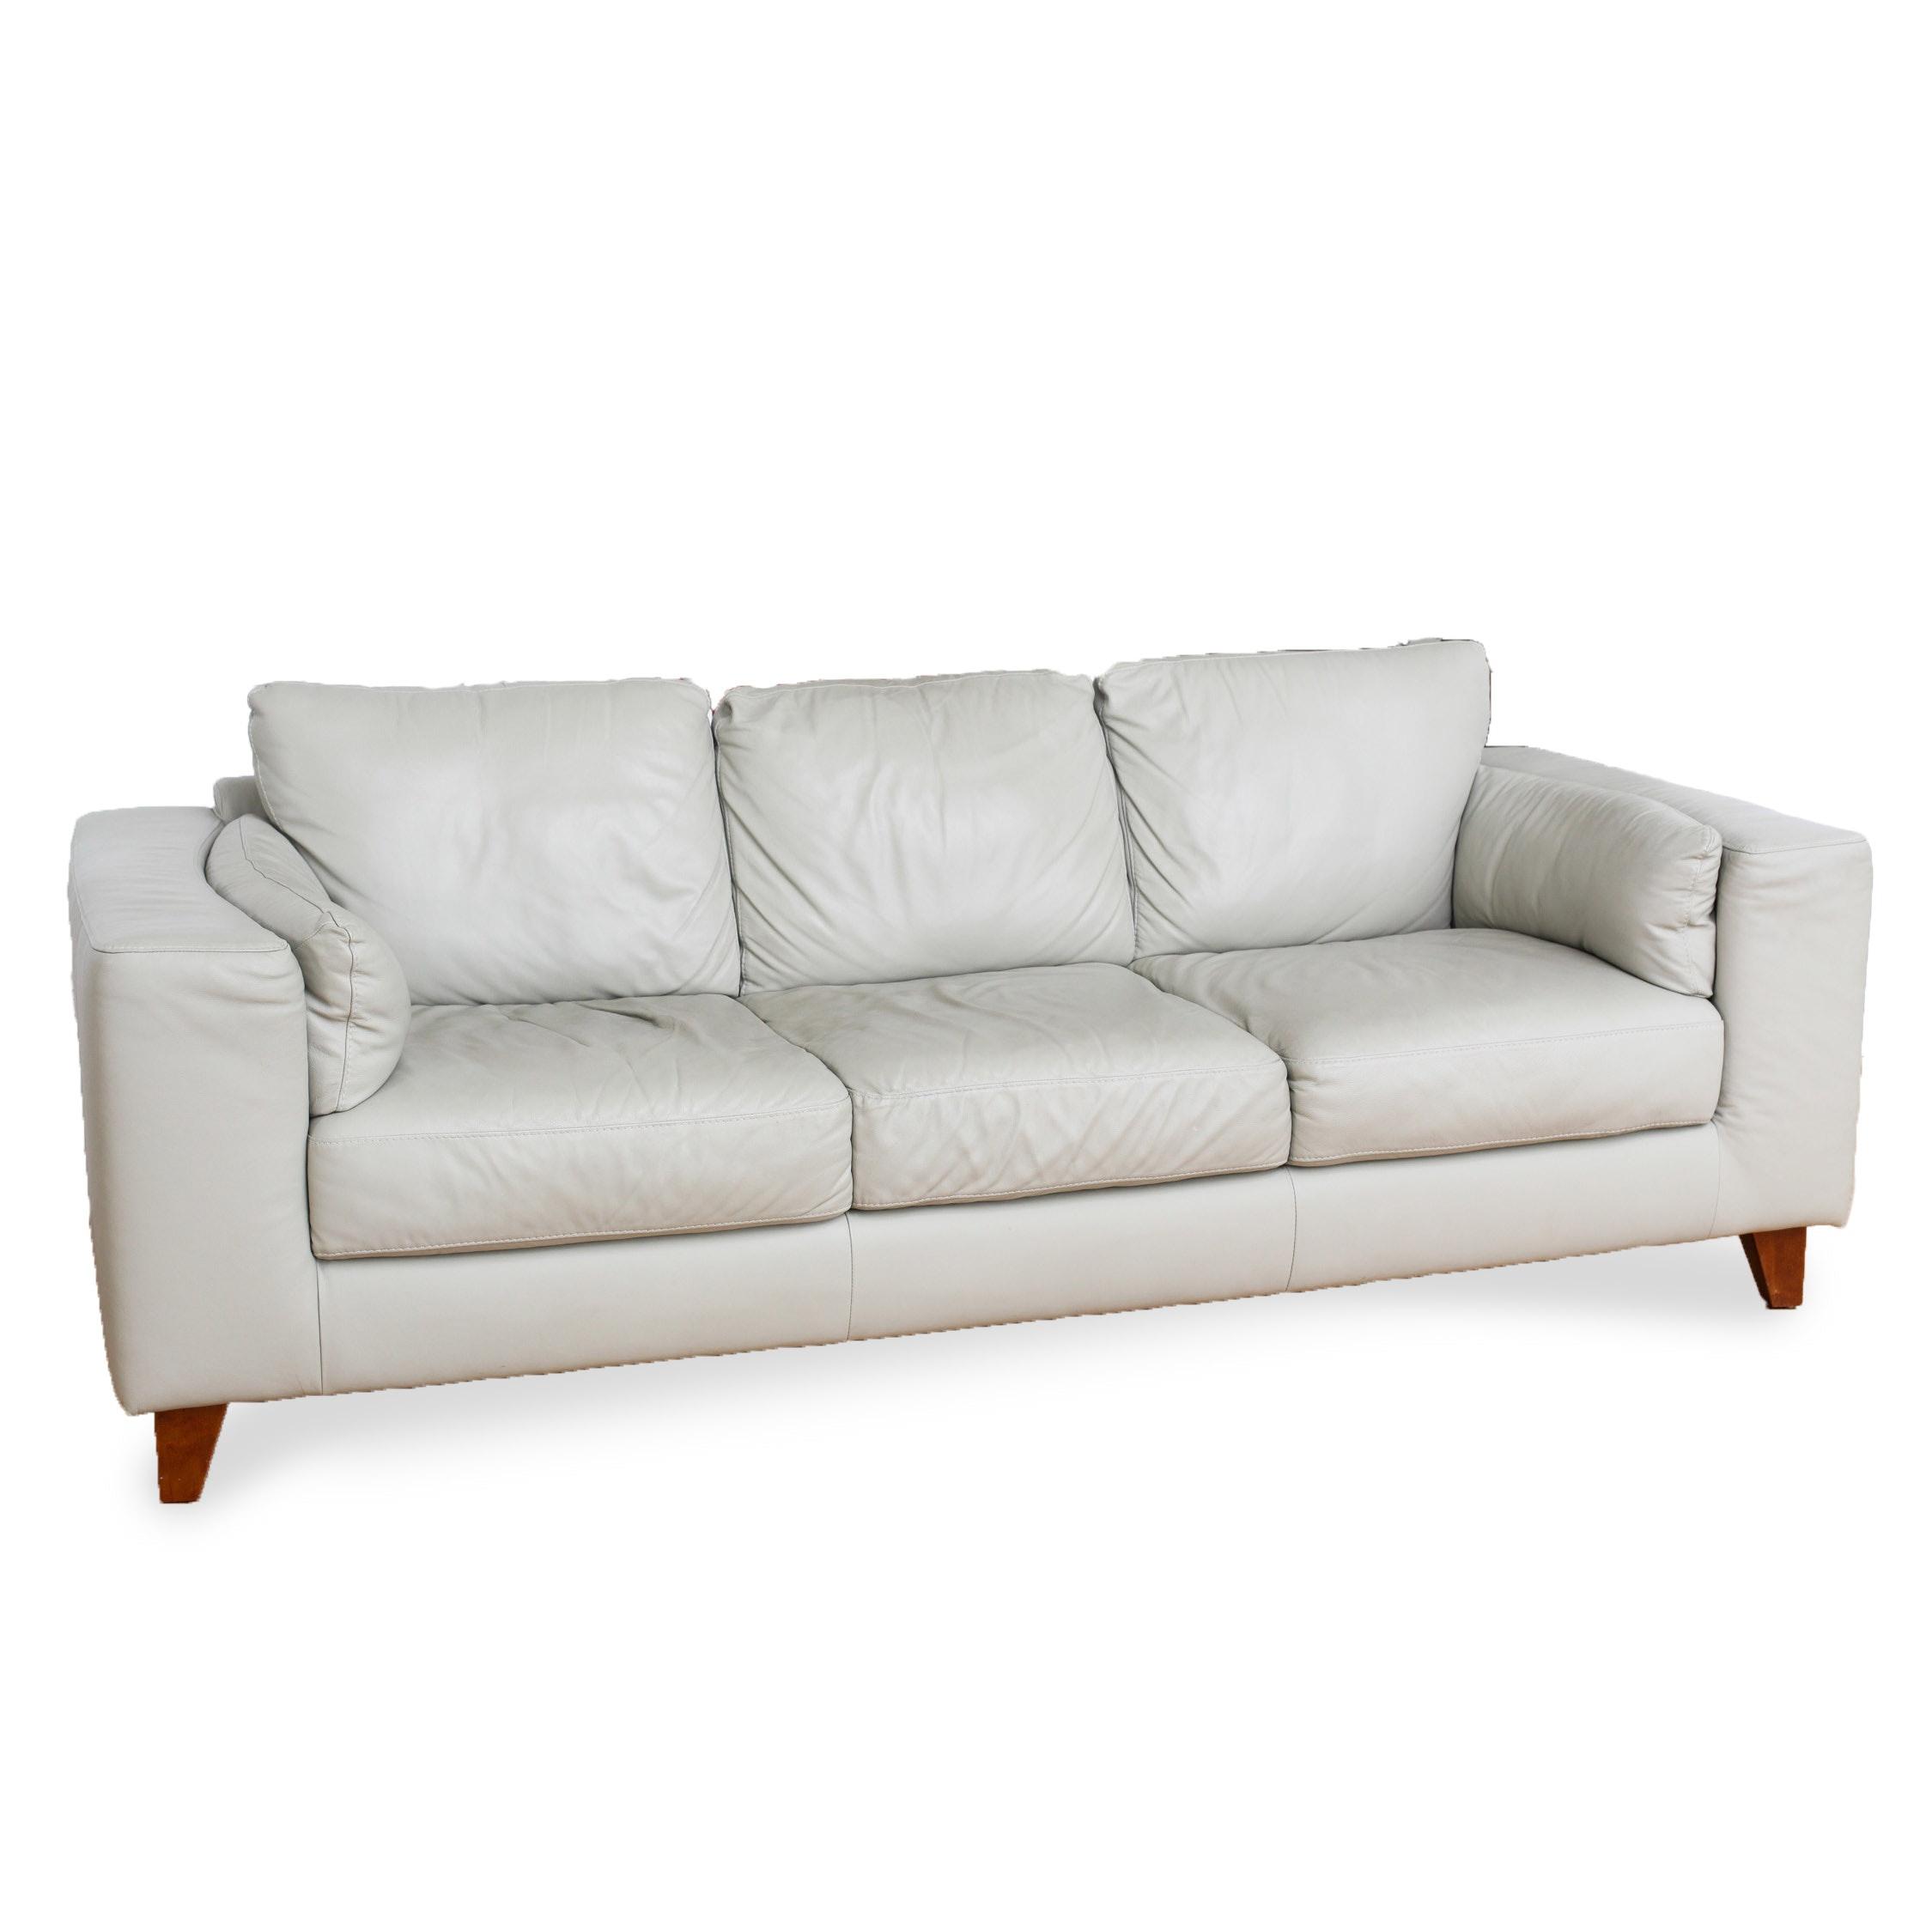 Italsofa Leather Sofa From Sprintz Furniture Nashville ...